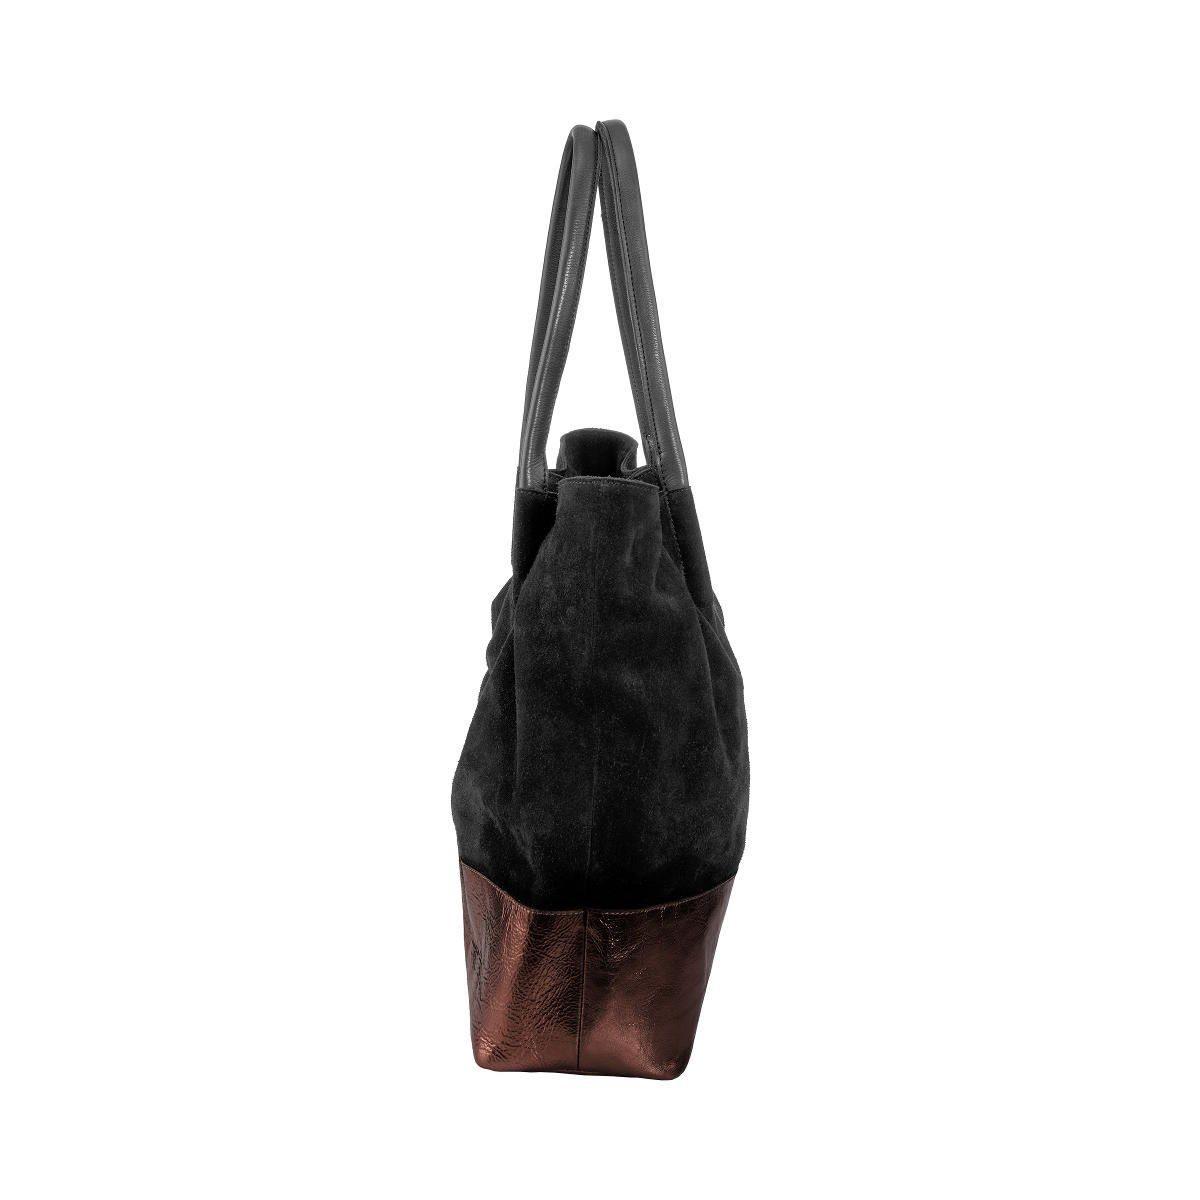 Online Kaufen Artikel Shopper Butlers Echtleder nr c4h533p Boutique qxTBnFf